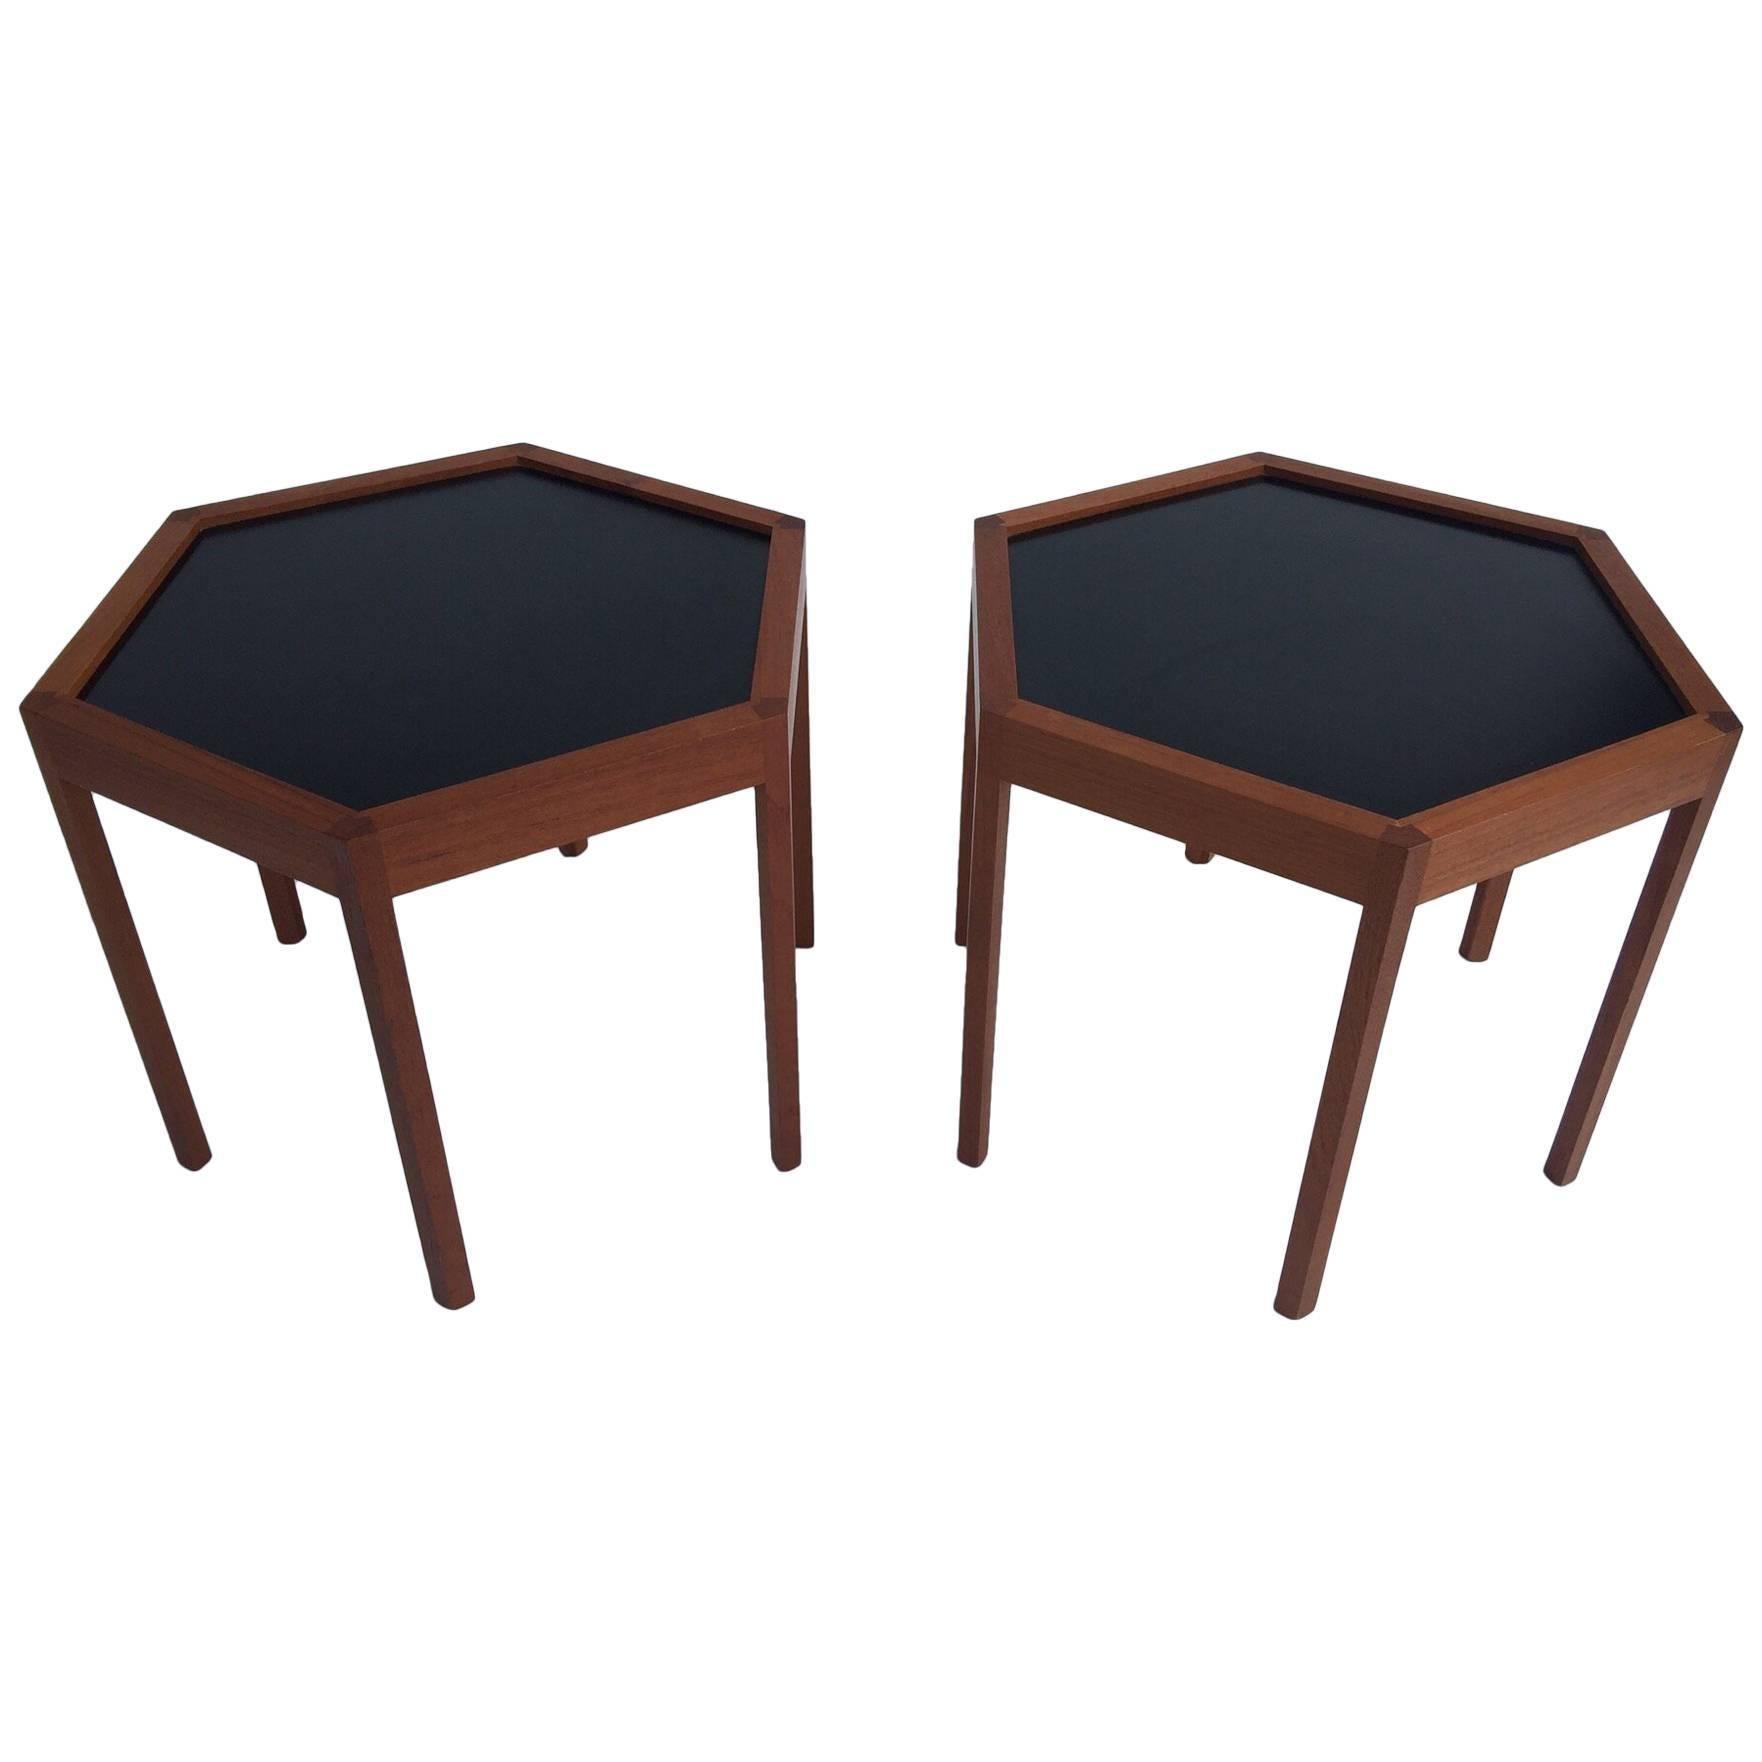 Hans C. Andersen for Arturo Teak Hexagonal Side Tables